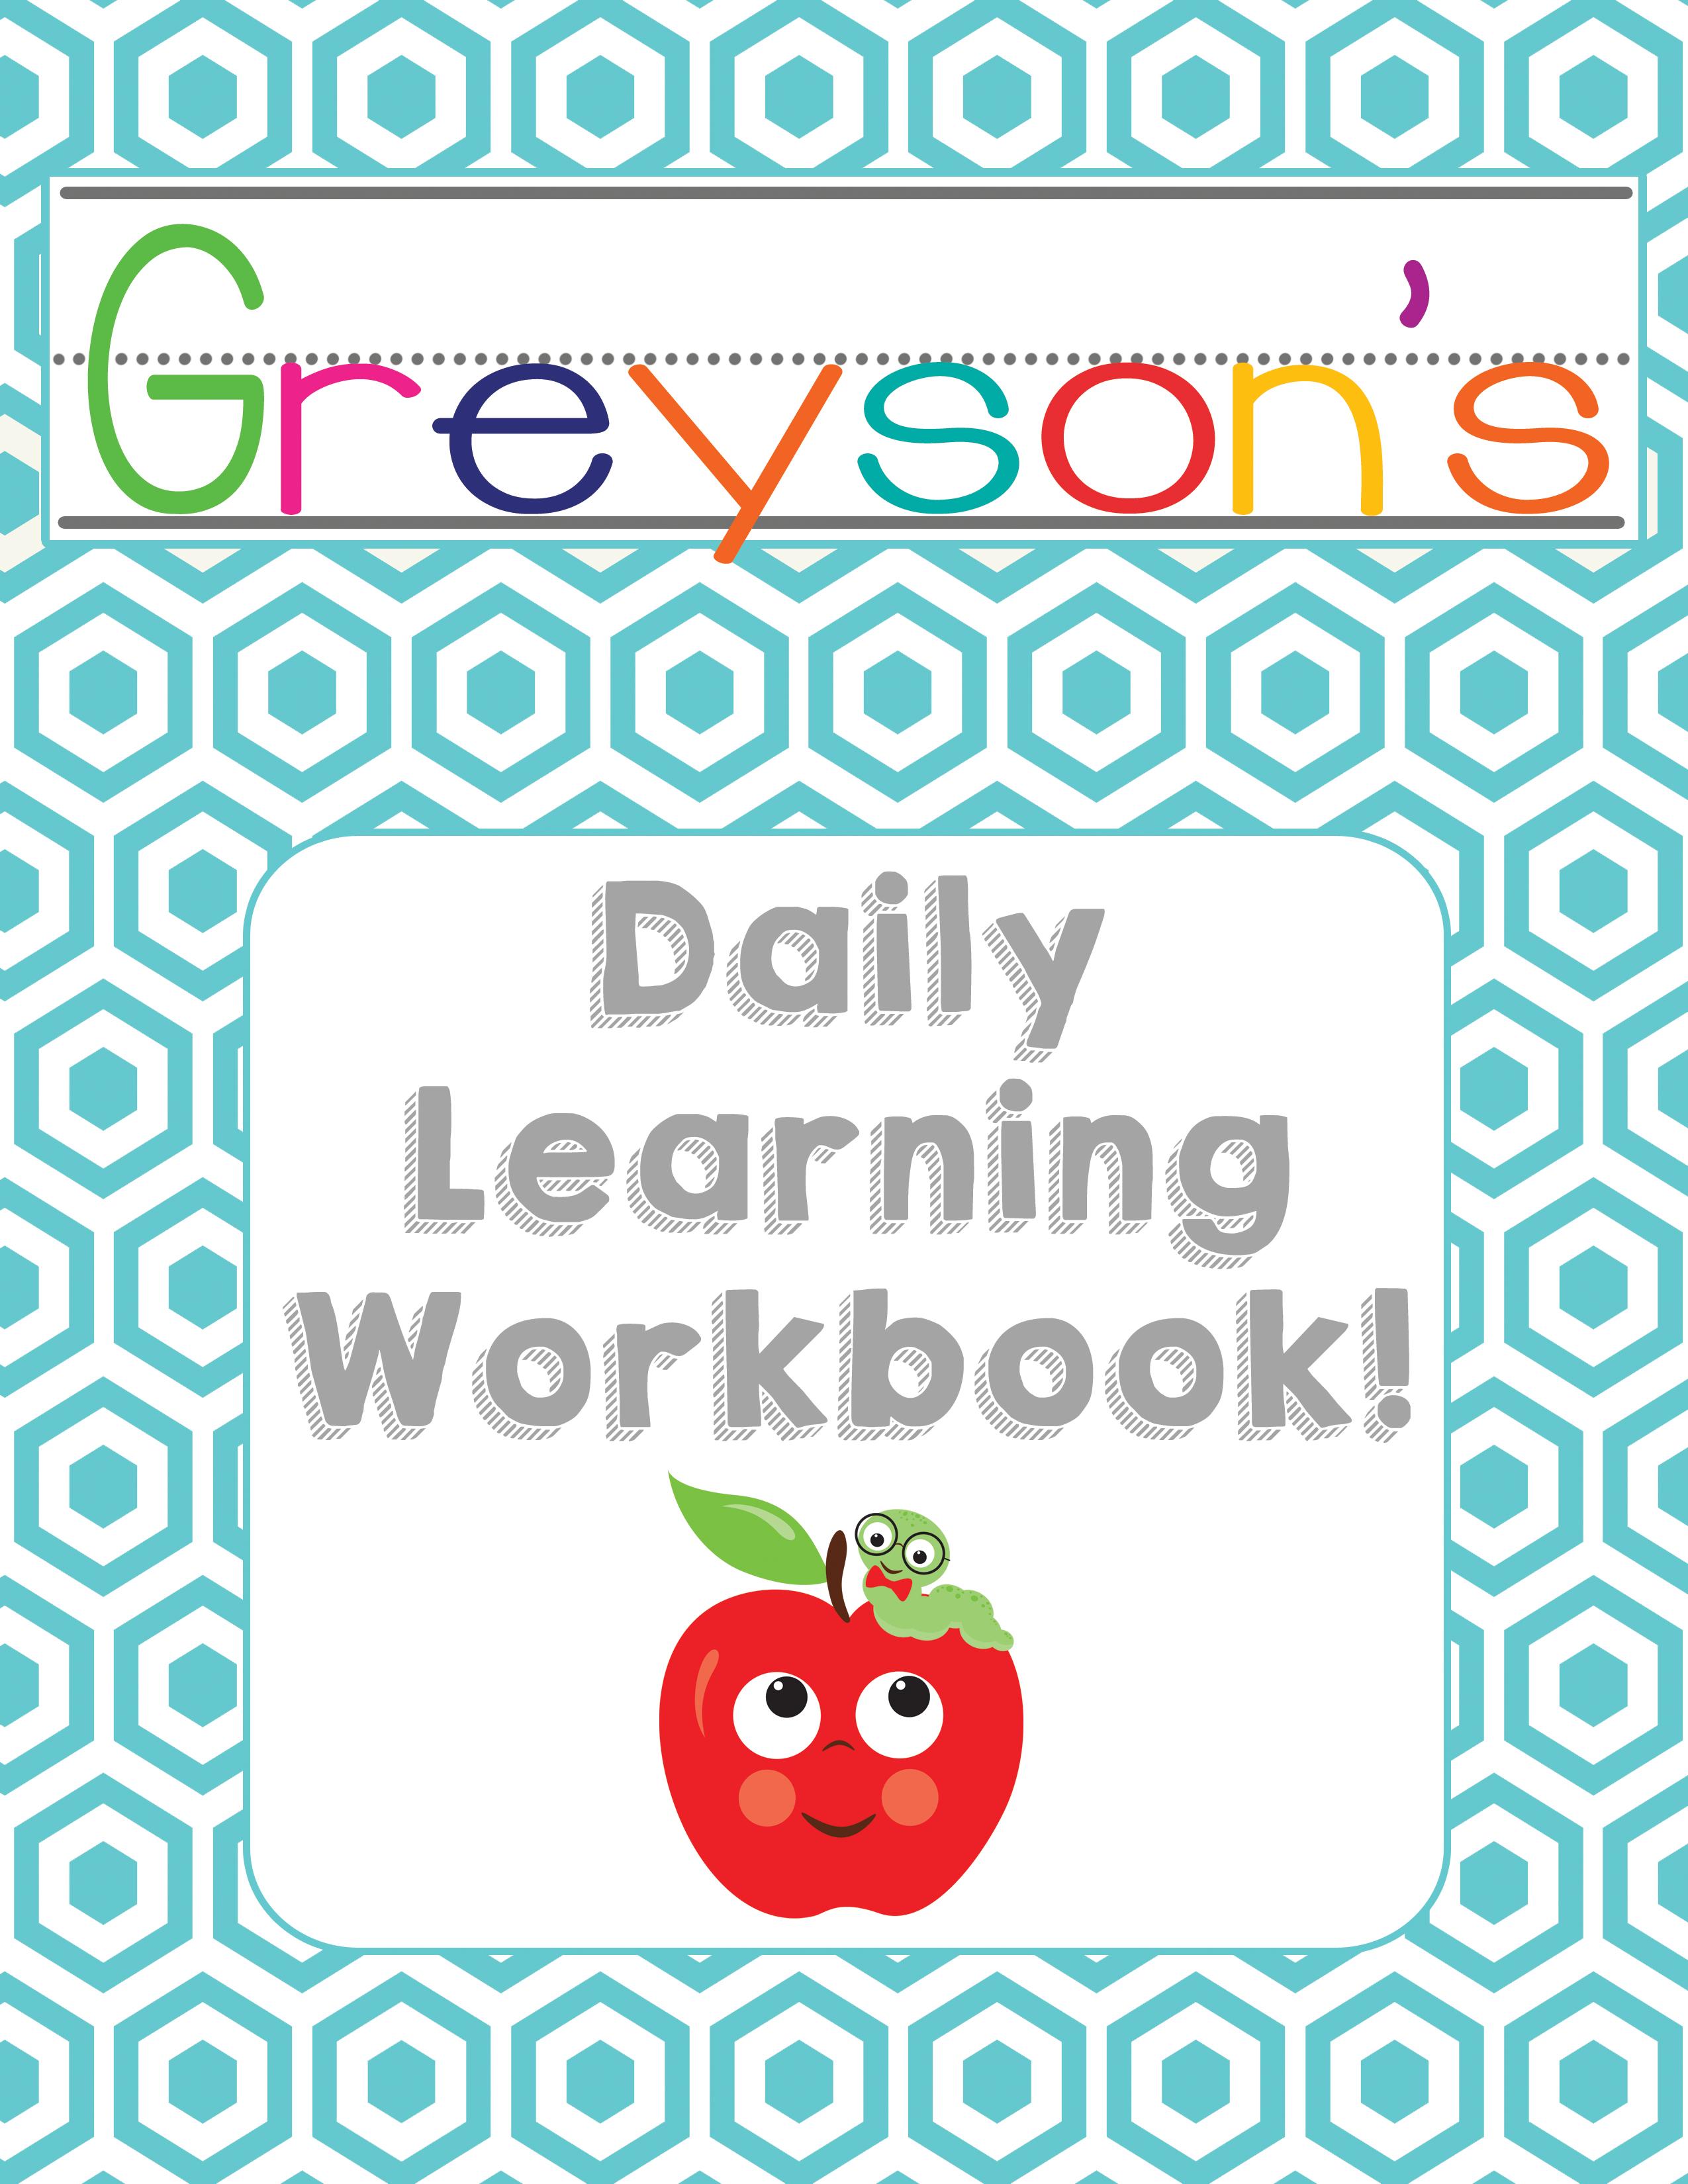 Customized Preschool Daily Learning Workbook » One Beautiful Home